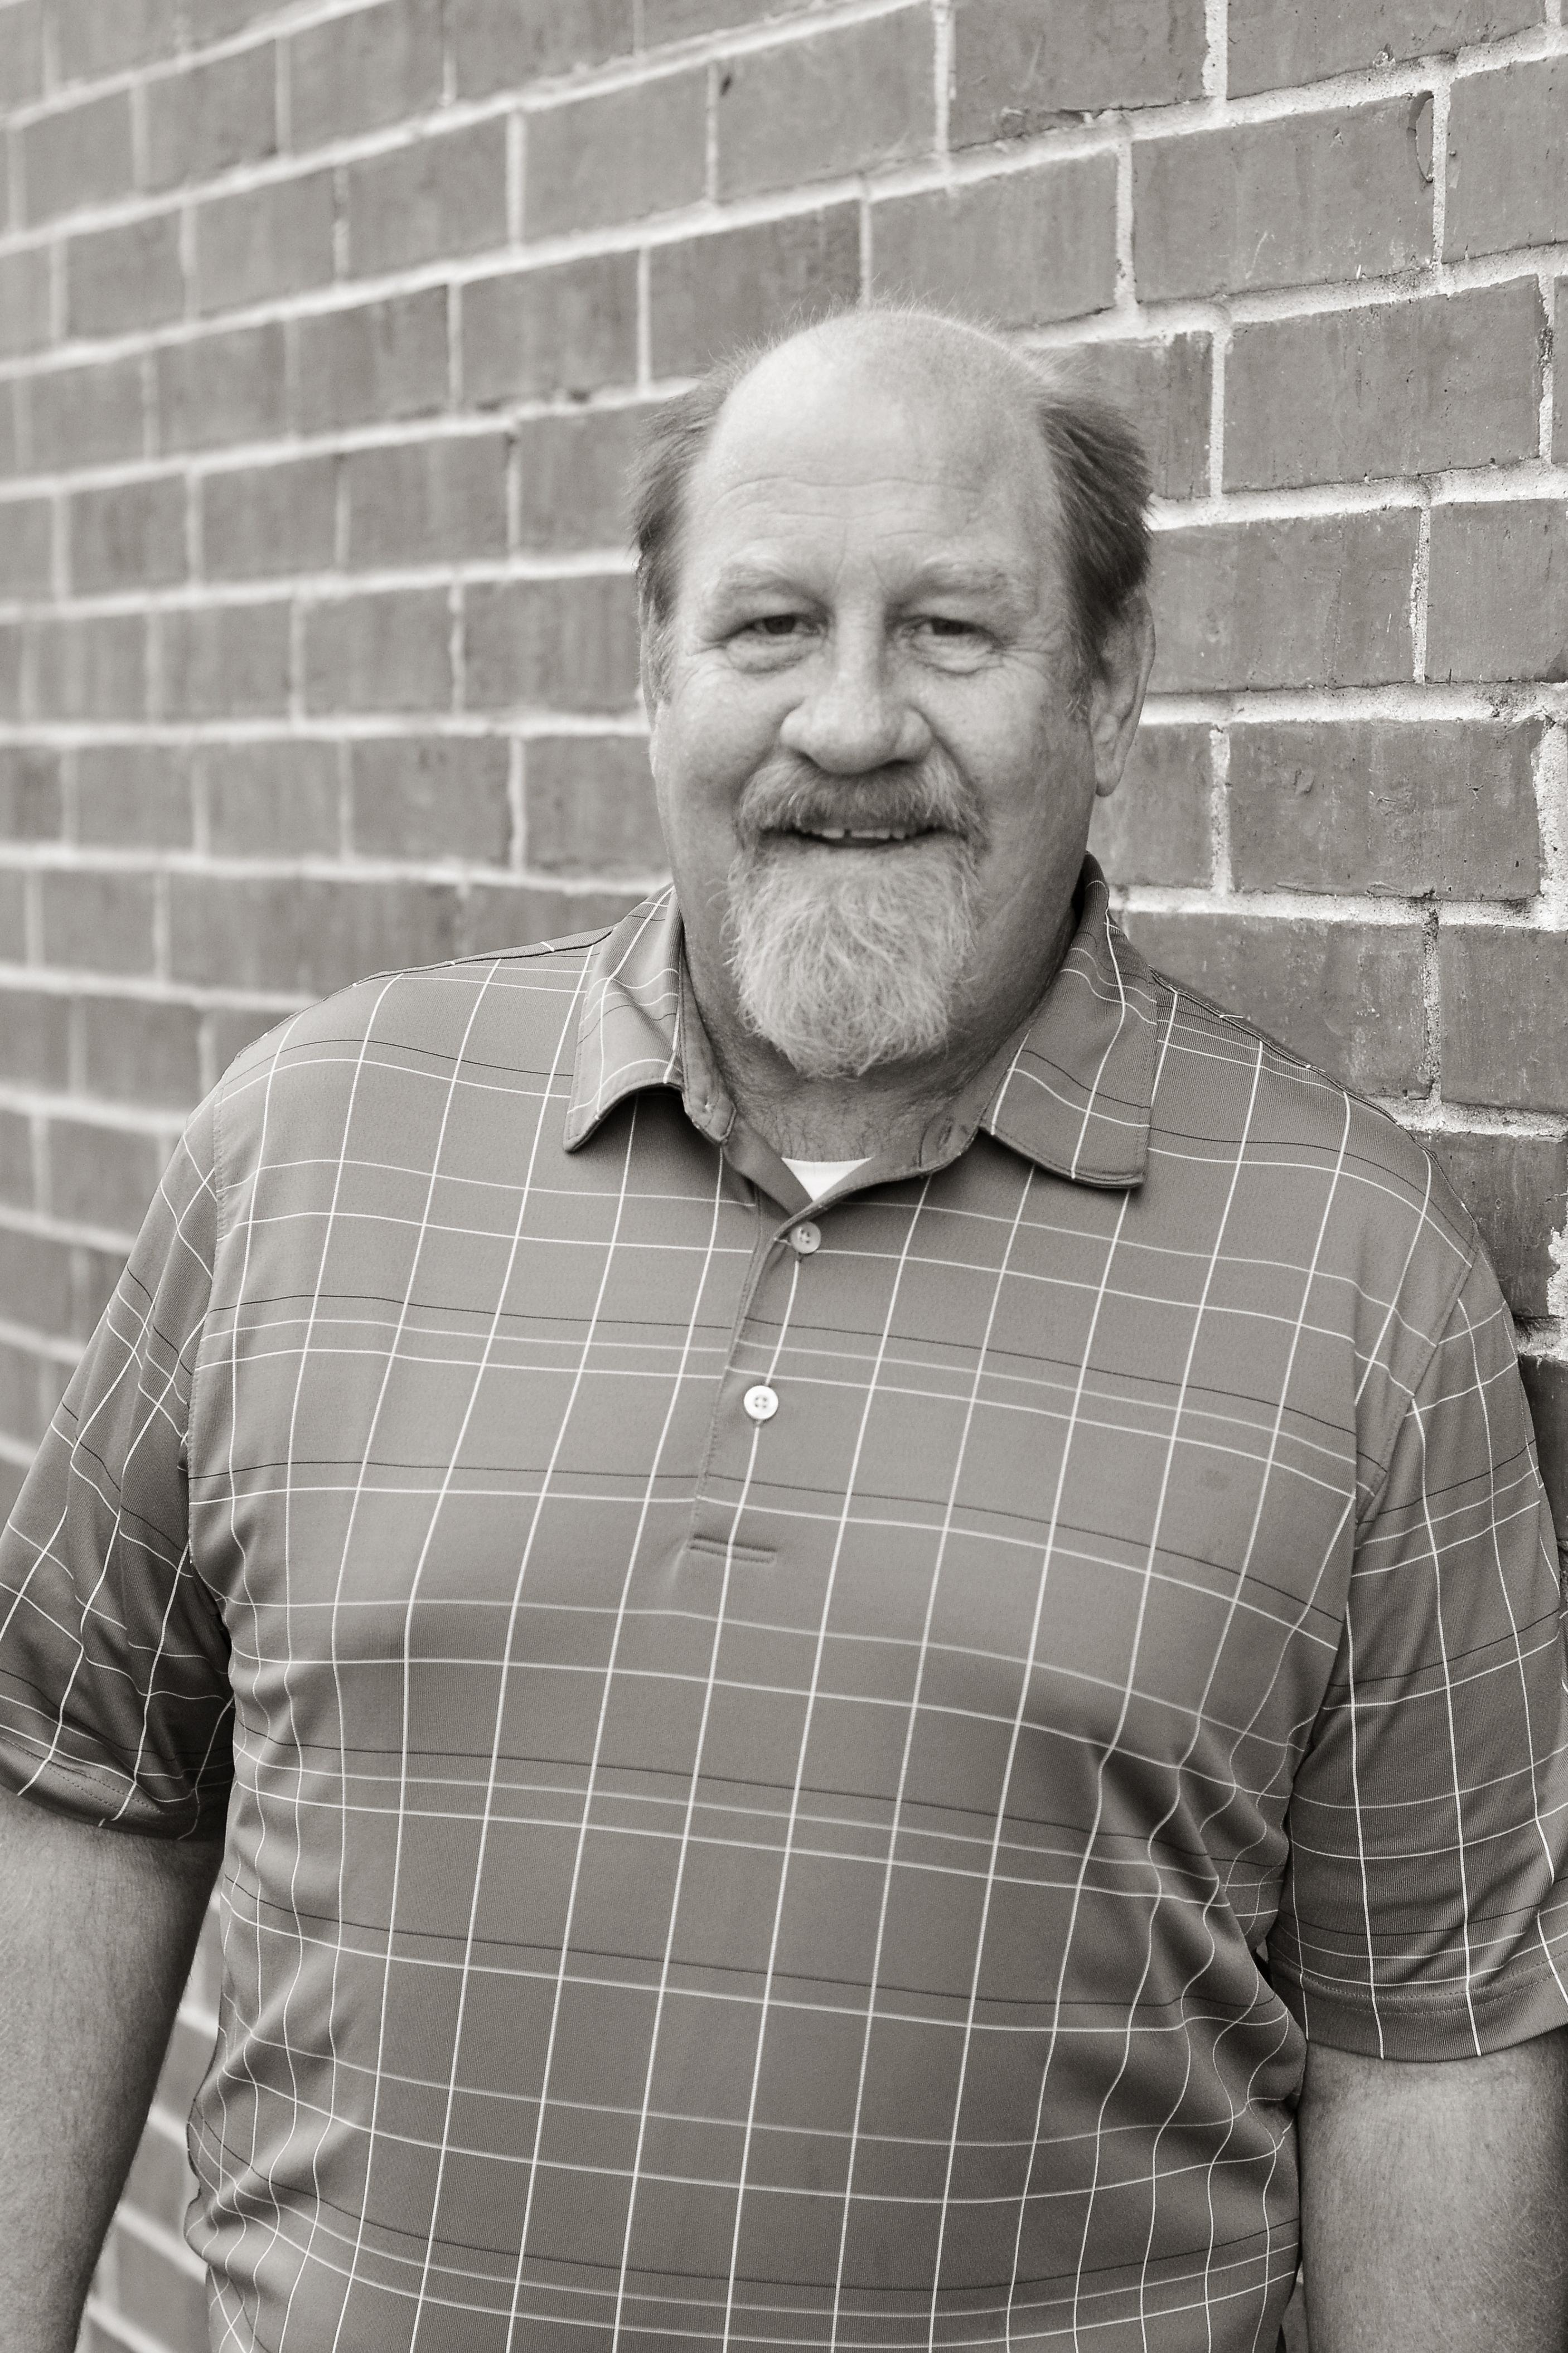 Mike Buchanan